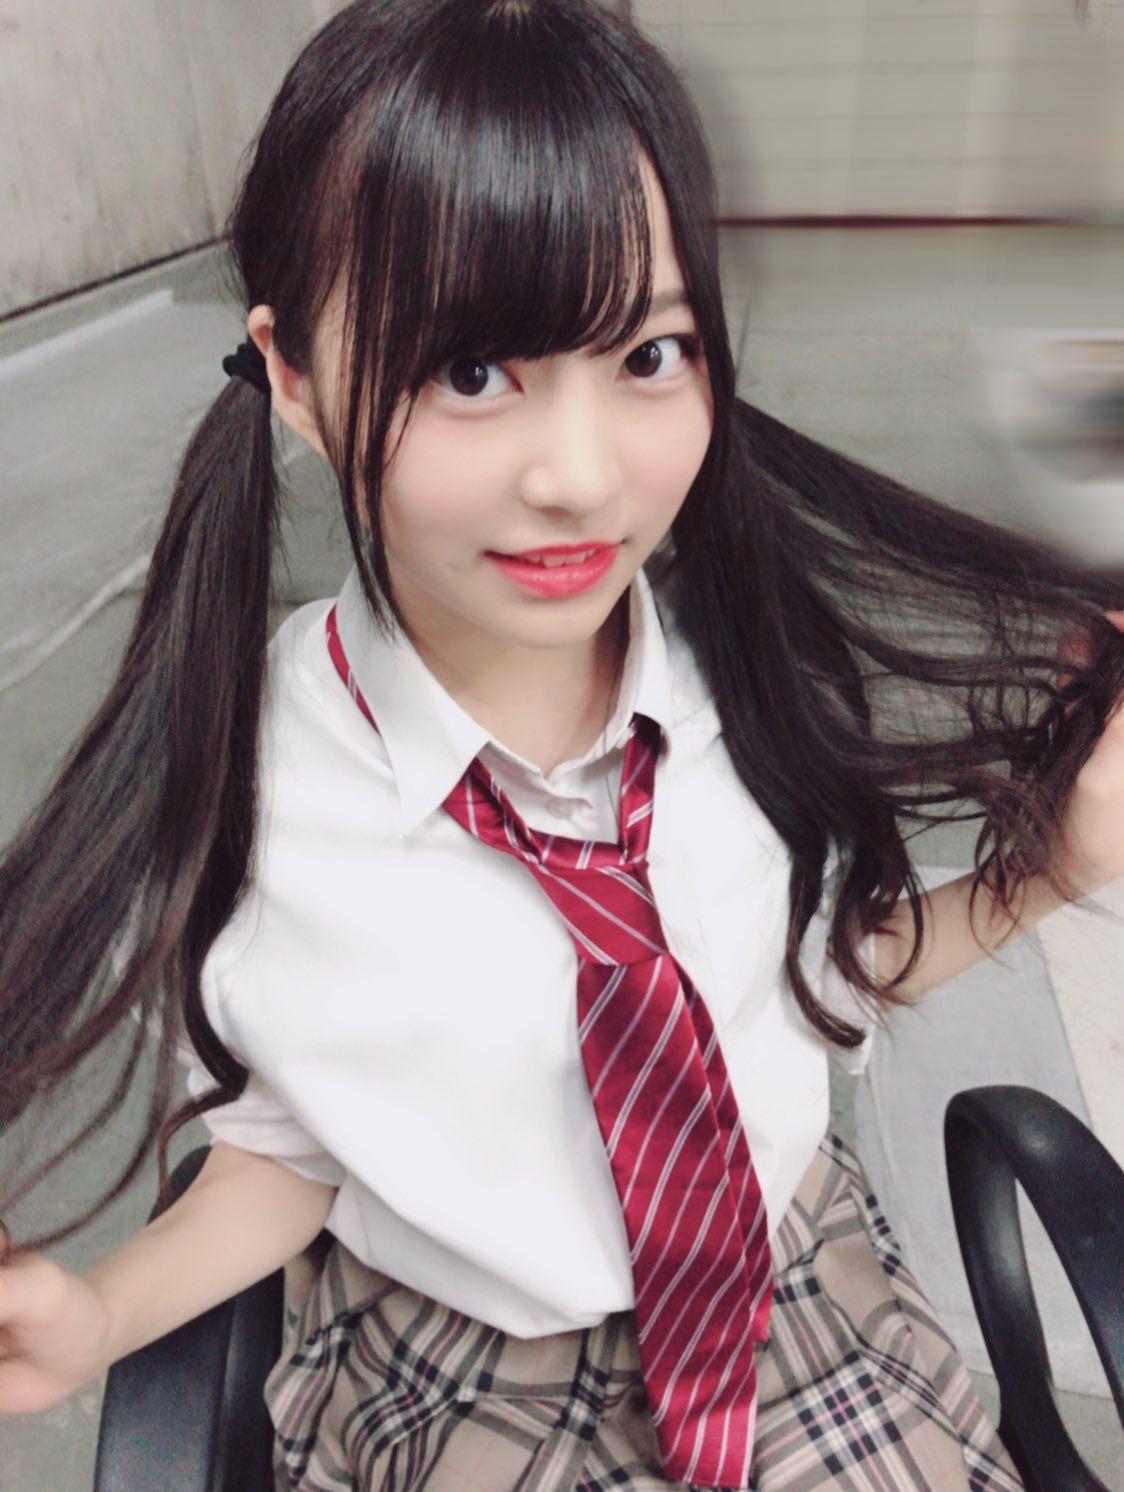 Pin on 制服少女(アイドル)